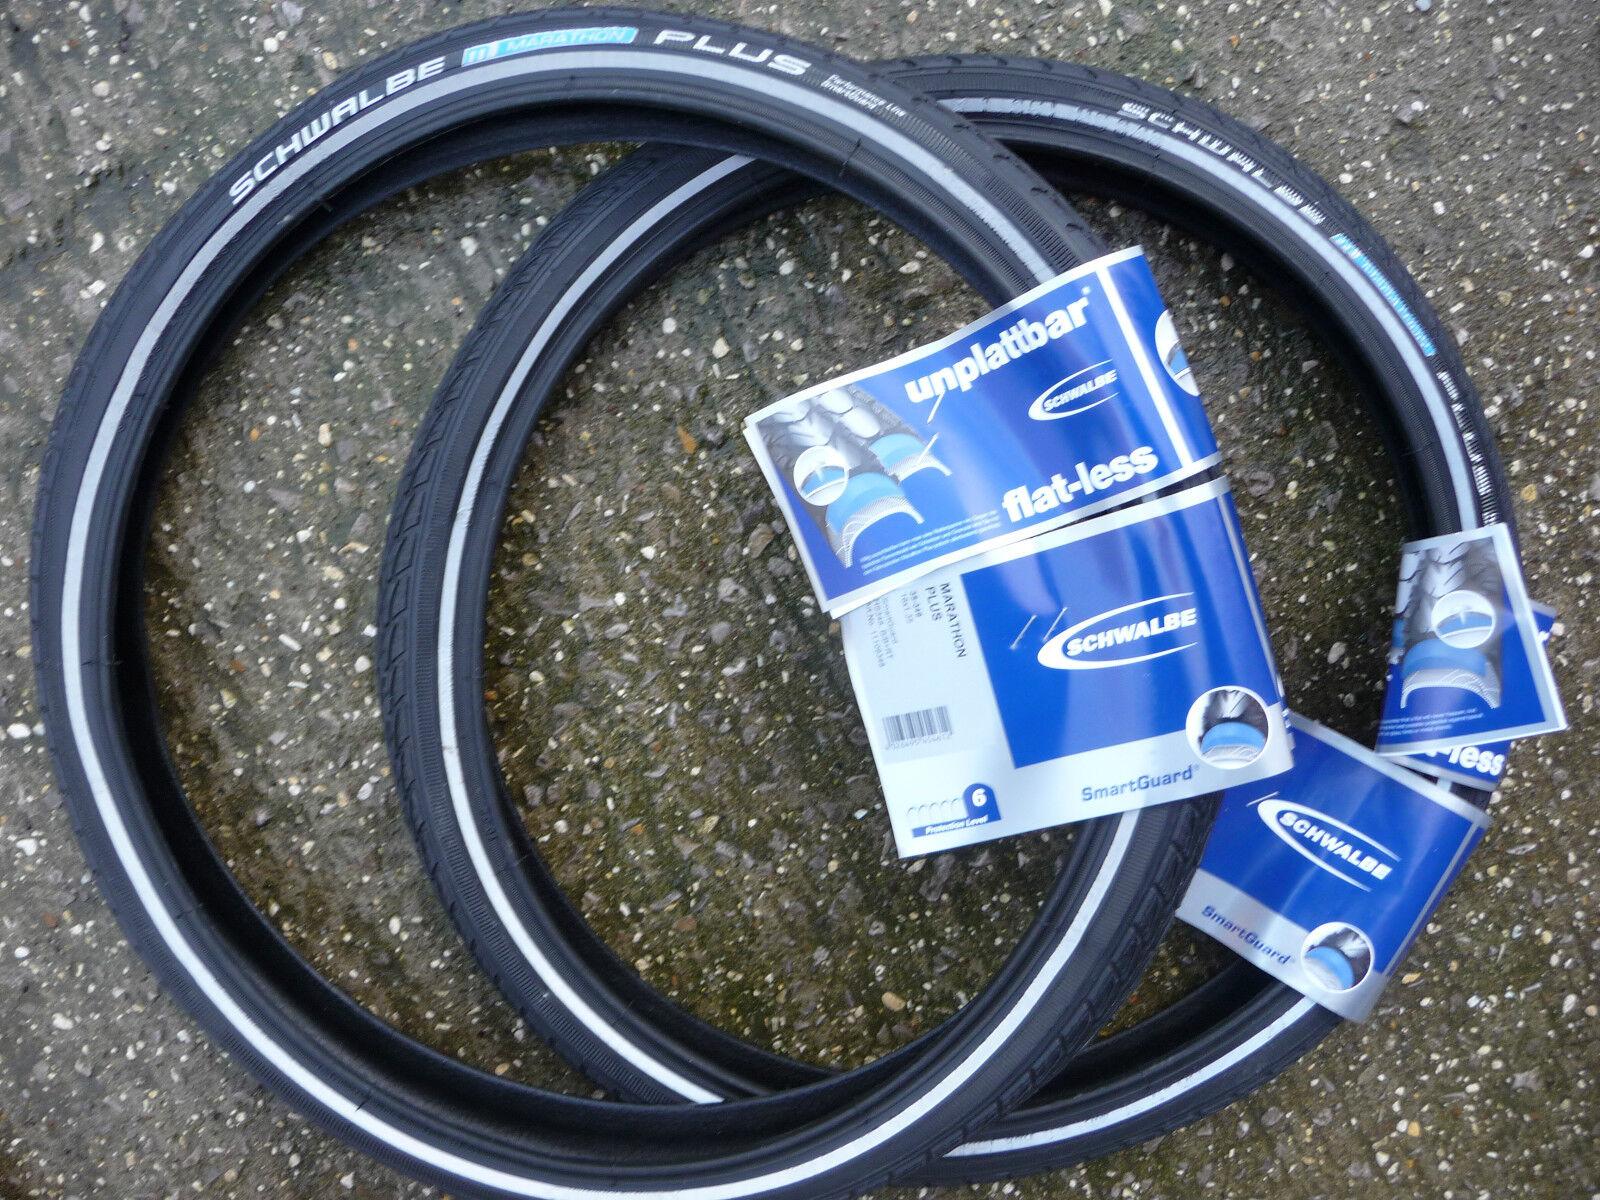 Pair Schwalbe Marathon PLUS 16x1 3  8 (16x1.35) (35-349) Brompton Bike Tyres  cheap and high quality